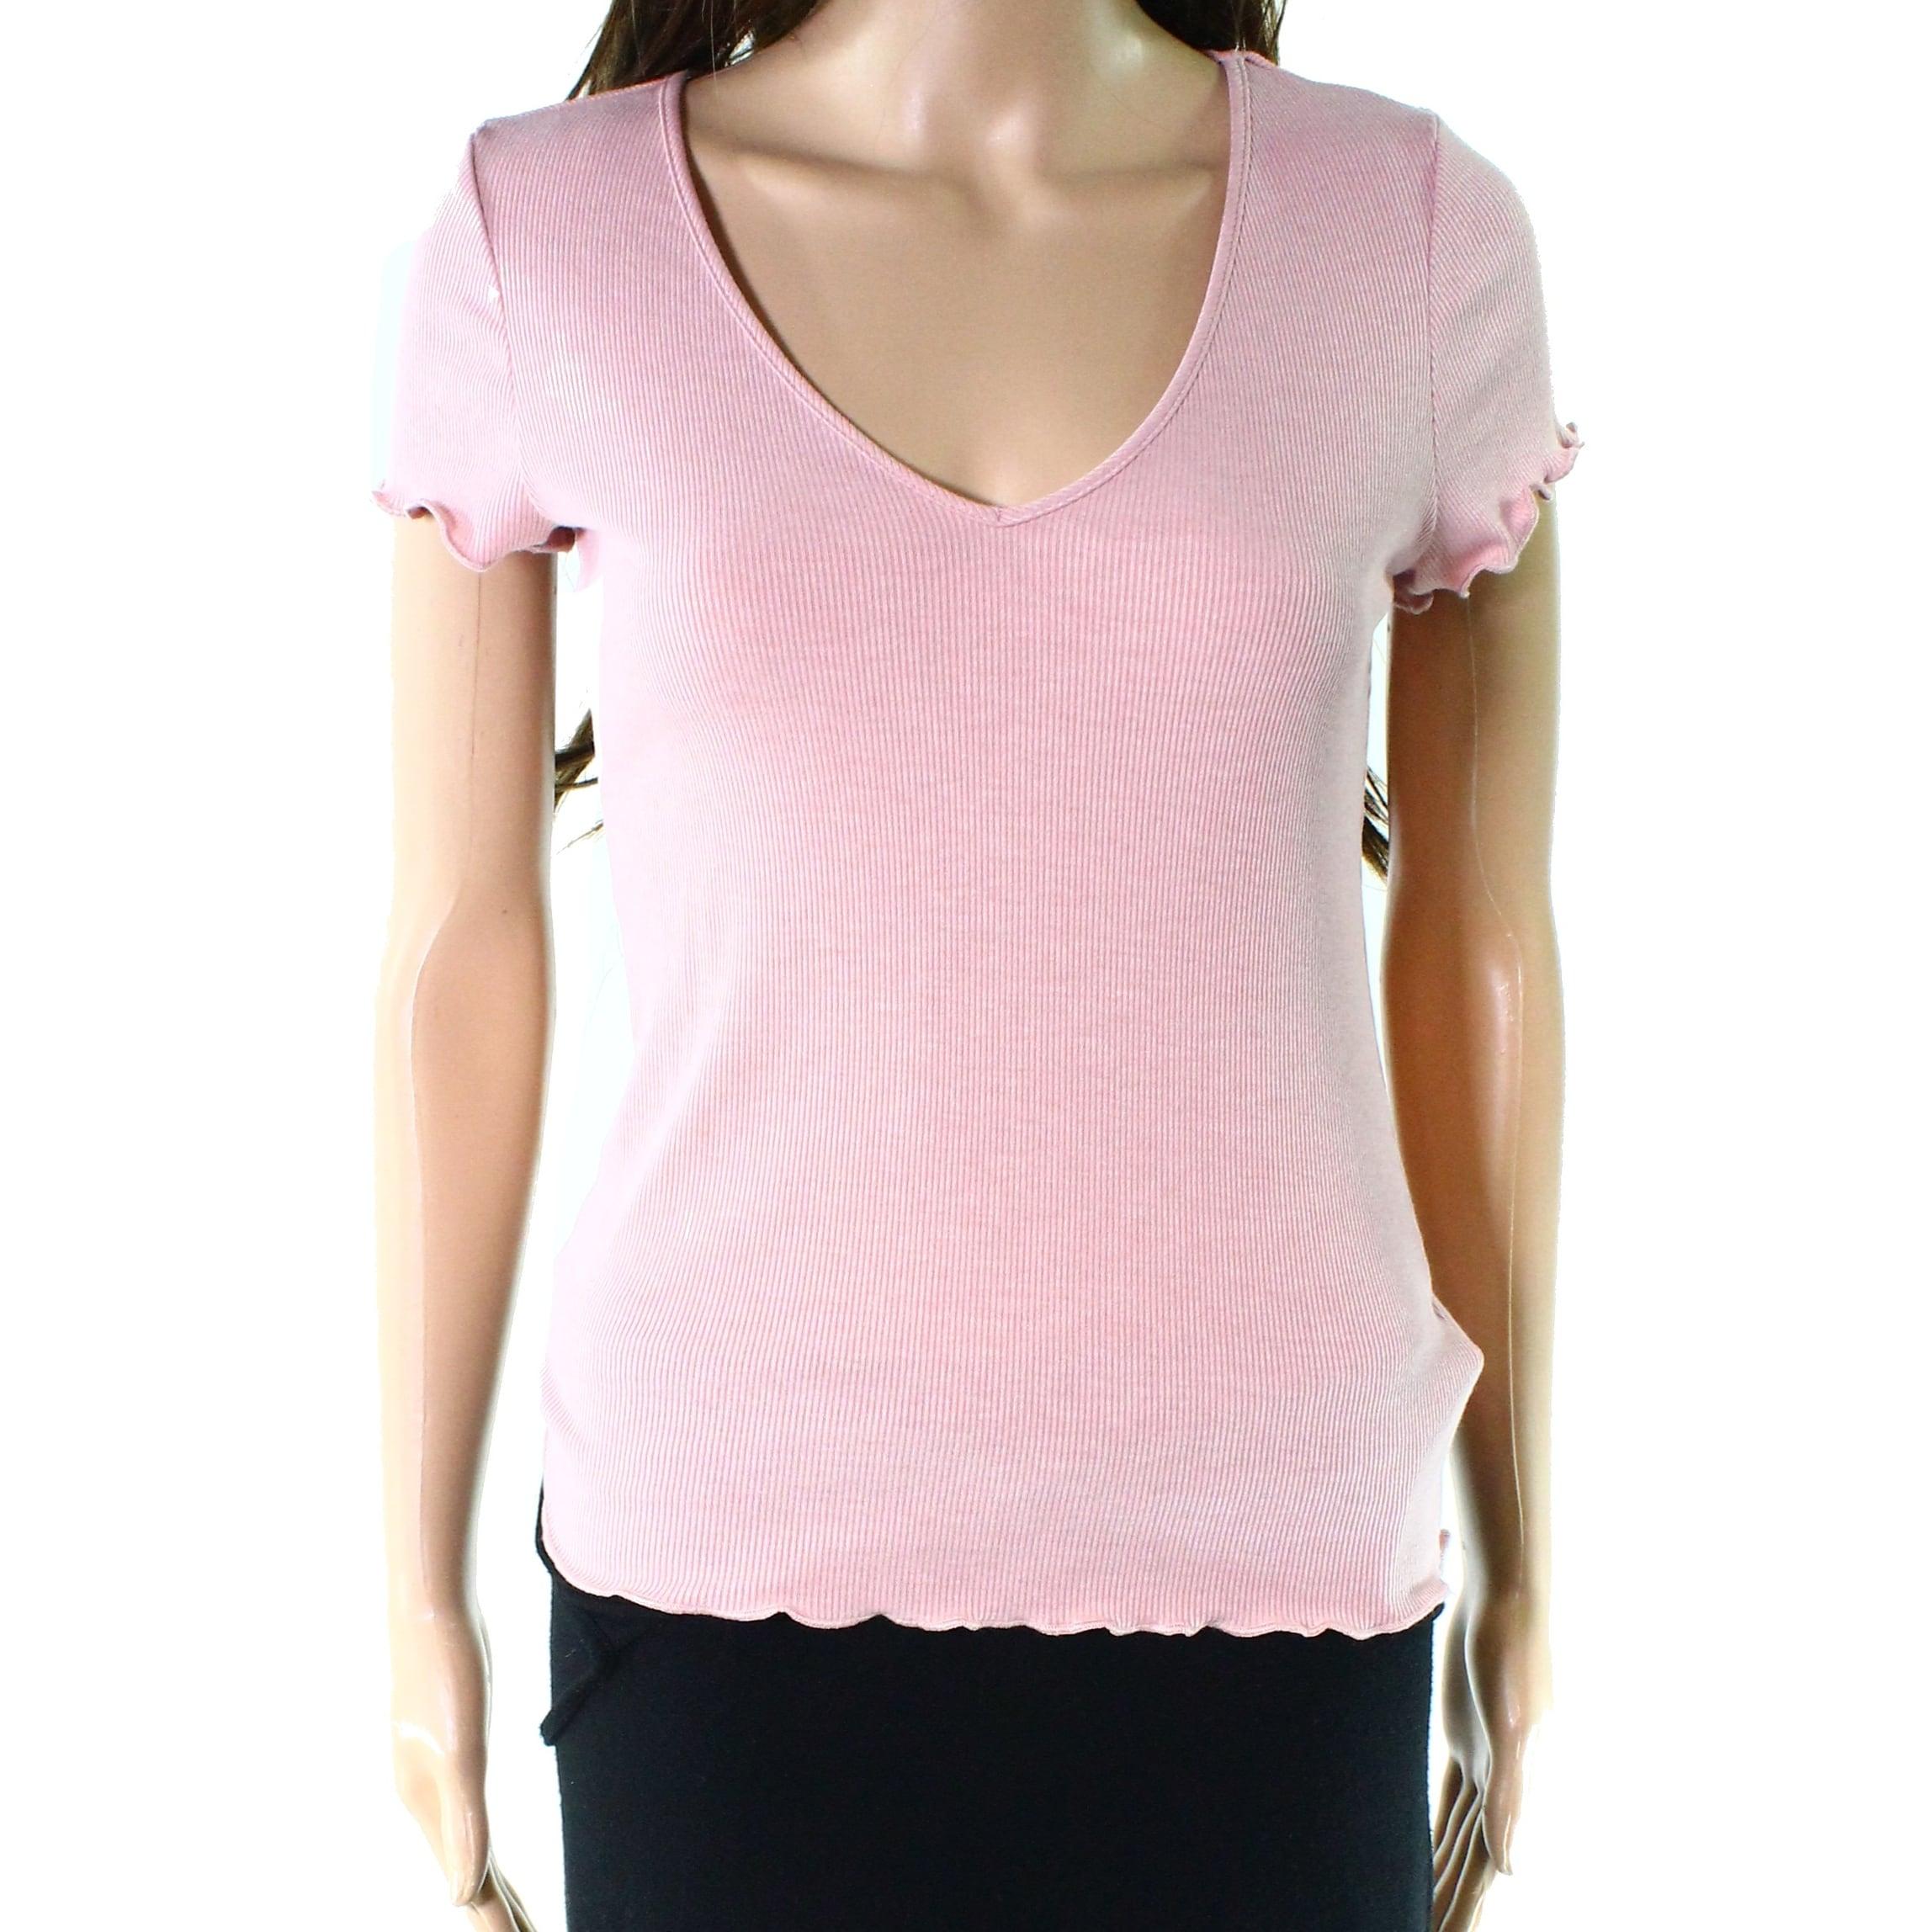 Womens Nike Fusia Pink V Neck Shirt Top Medium M Activewear Women's Clothing